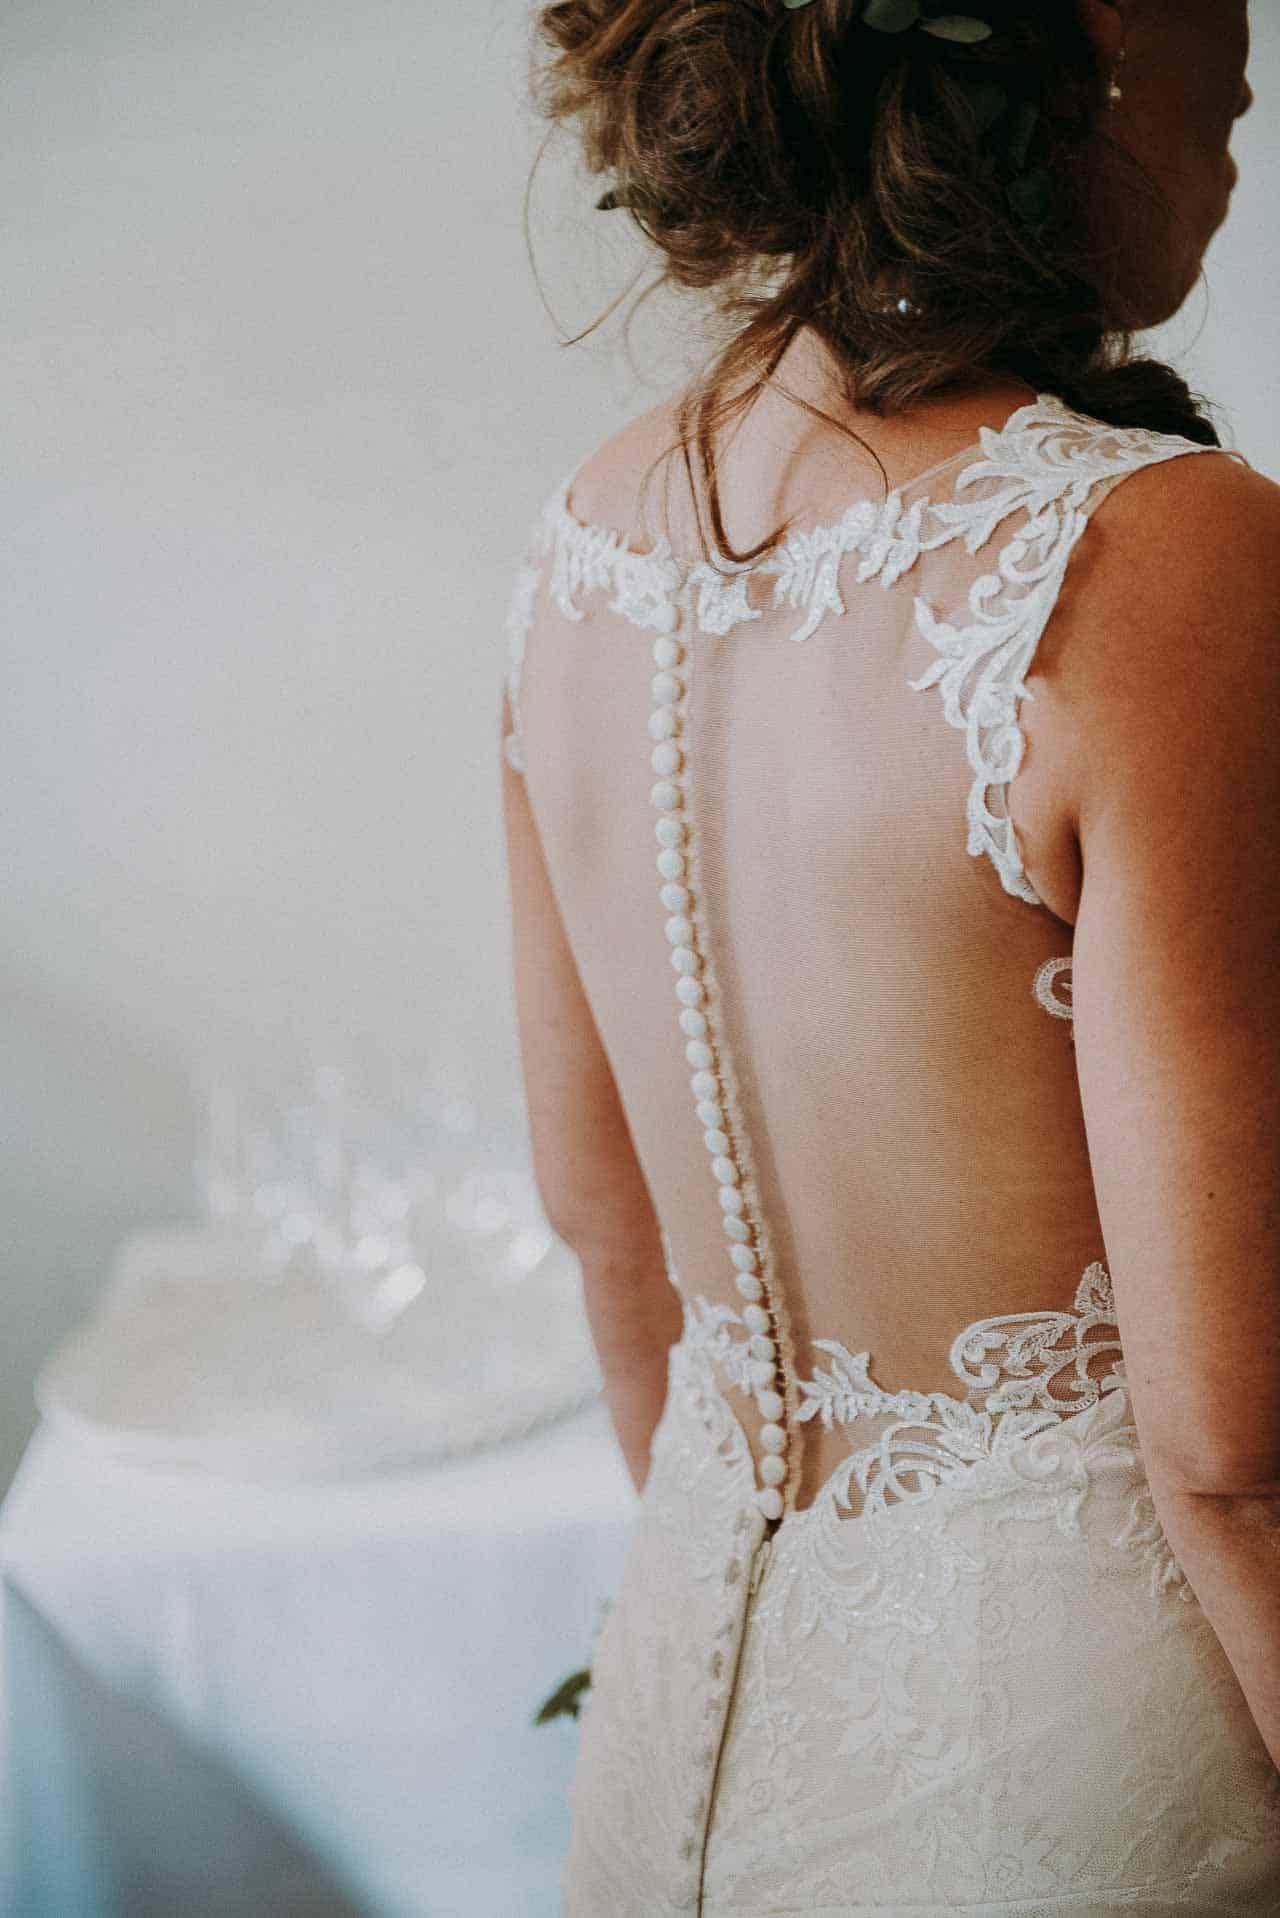 Find drømme brudekjolen